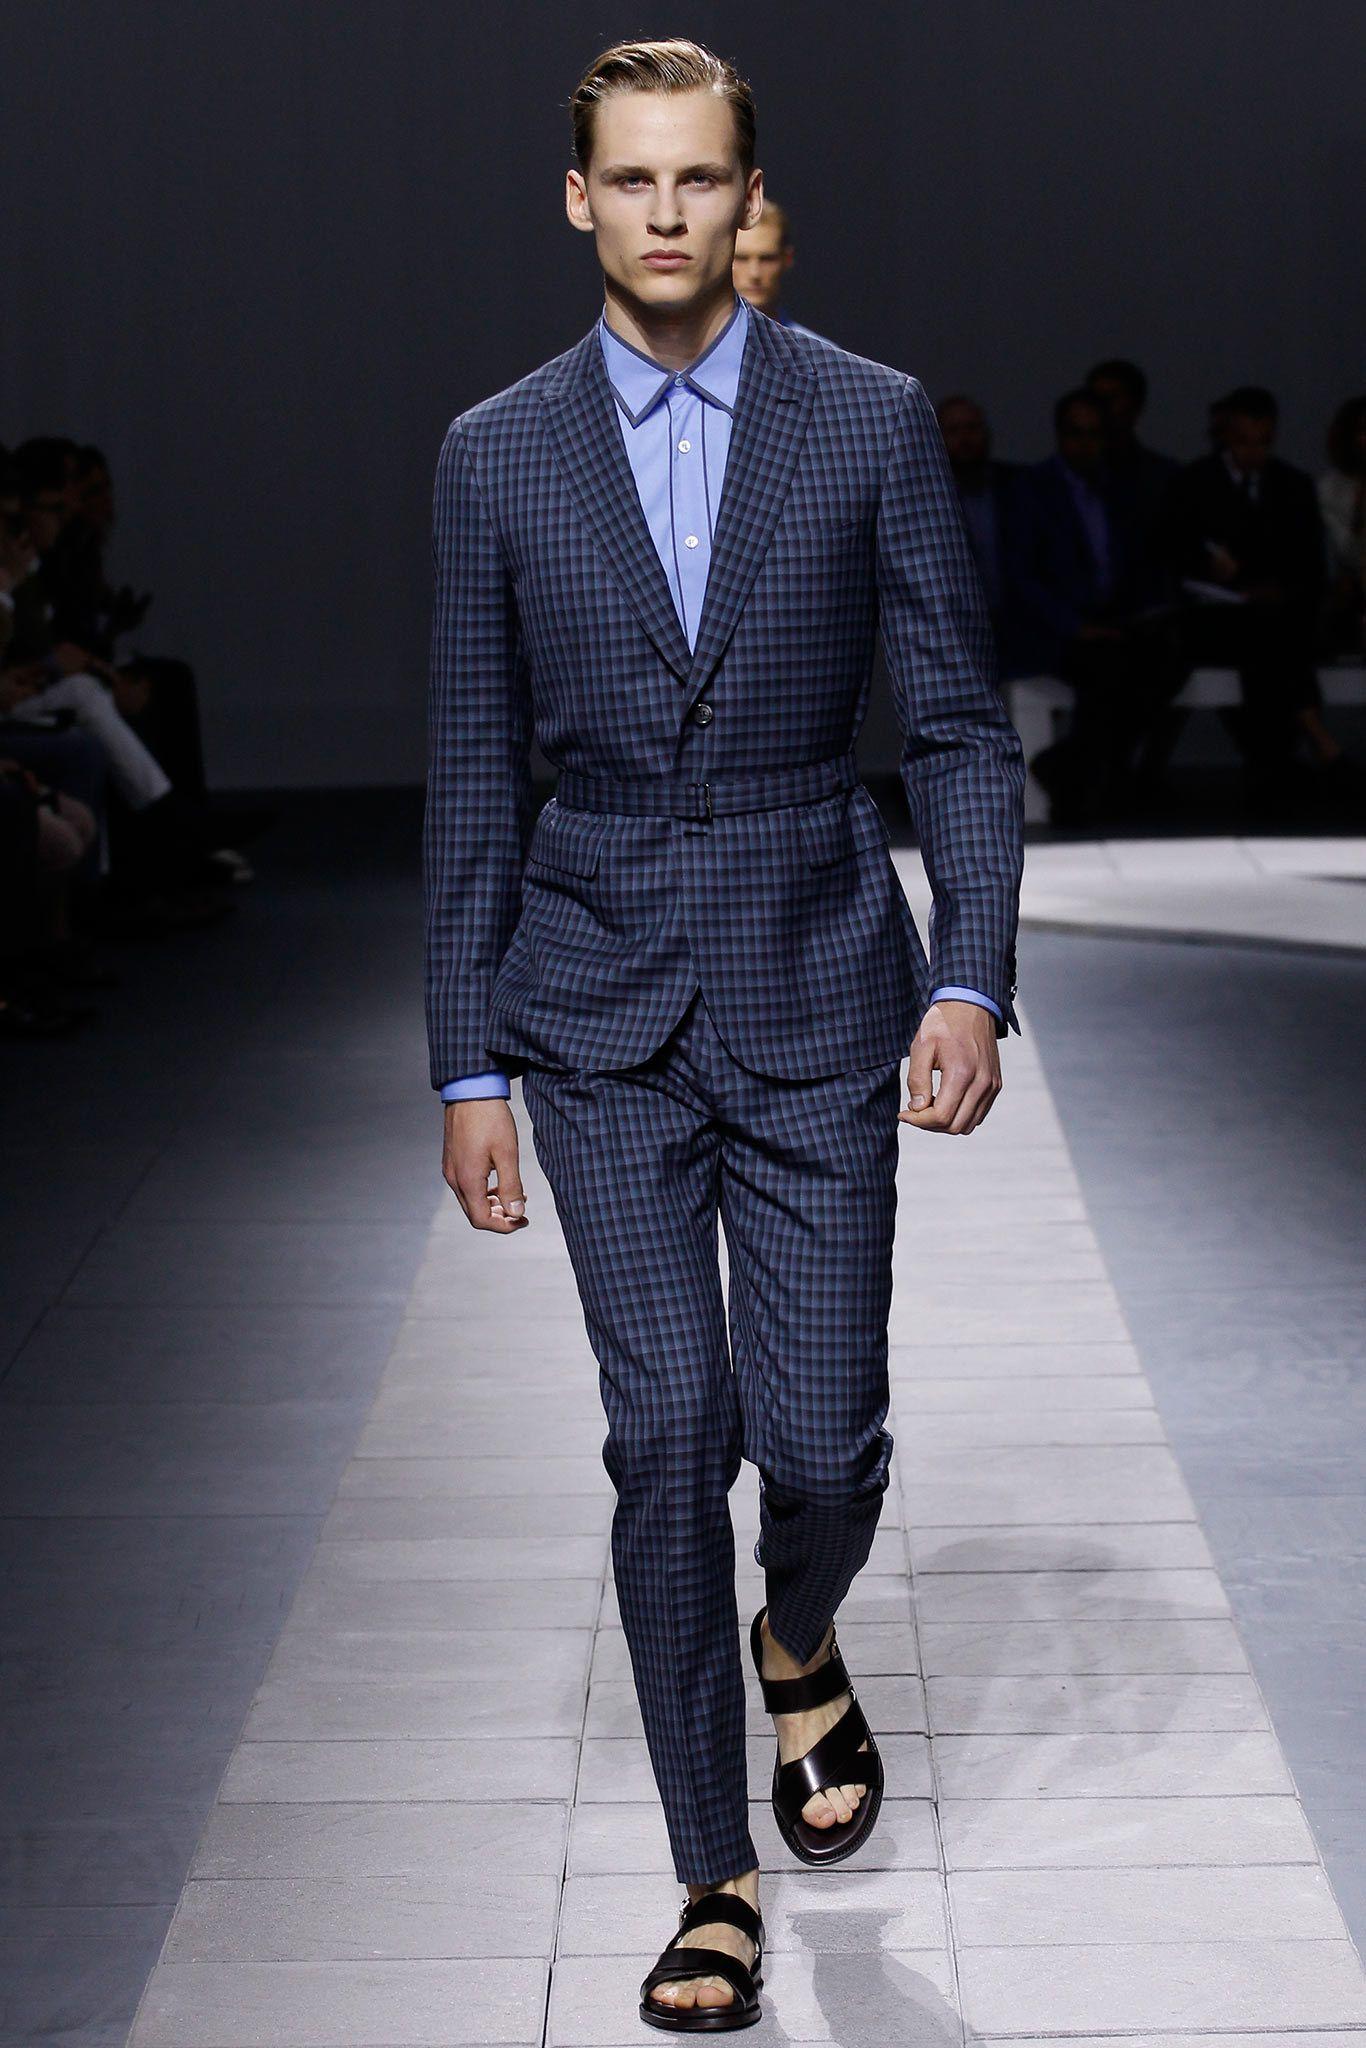 Brioni Spring 2016 Menswear Fashion Show in 2019  acdad6d6817